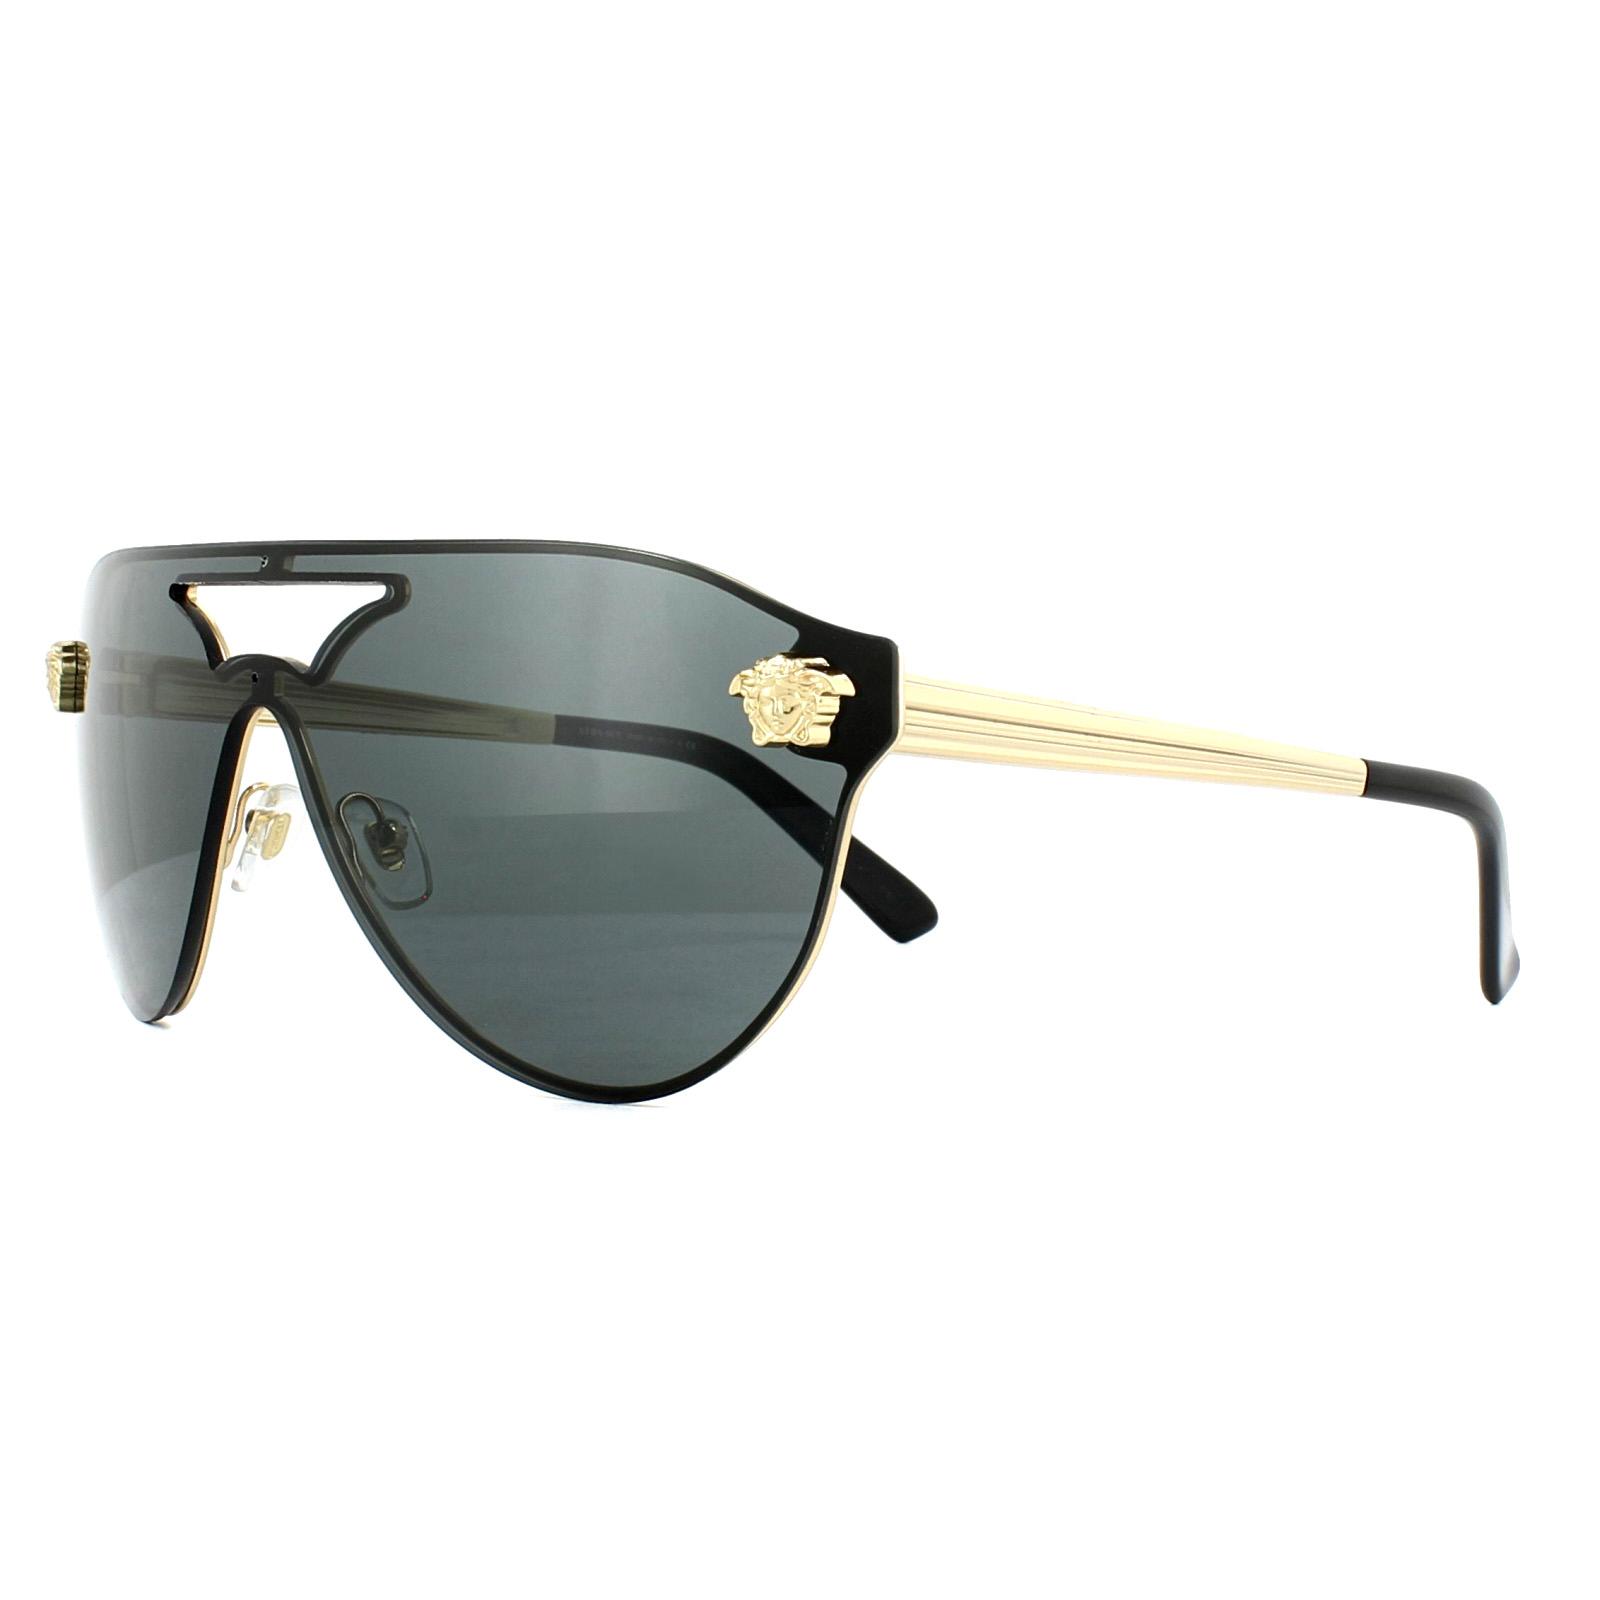 3b1029aad1aa7 Sentinel Versace Sunglasses VE2161 100287 Gold Black Grey